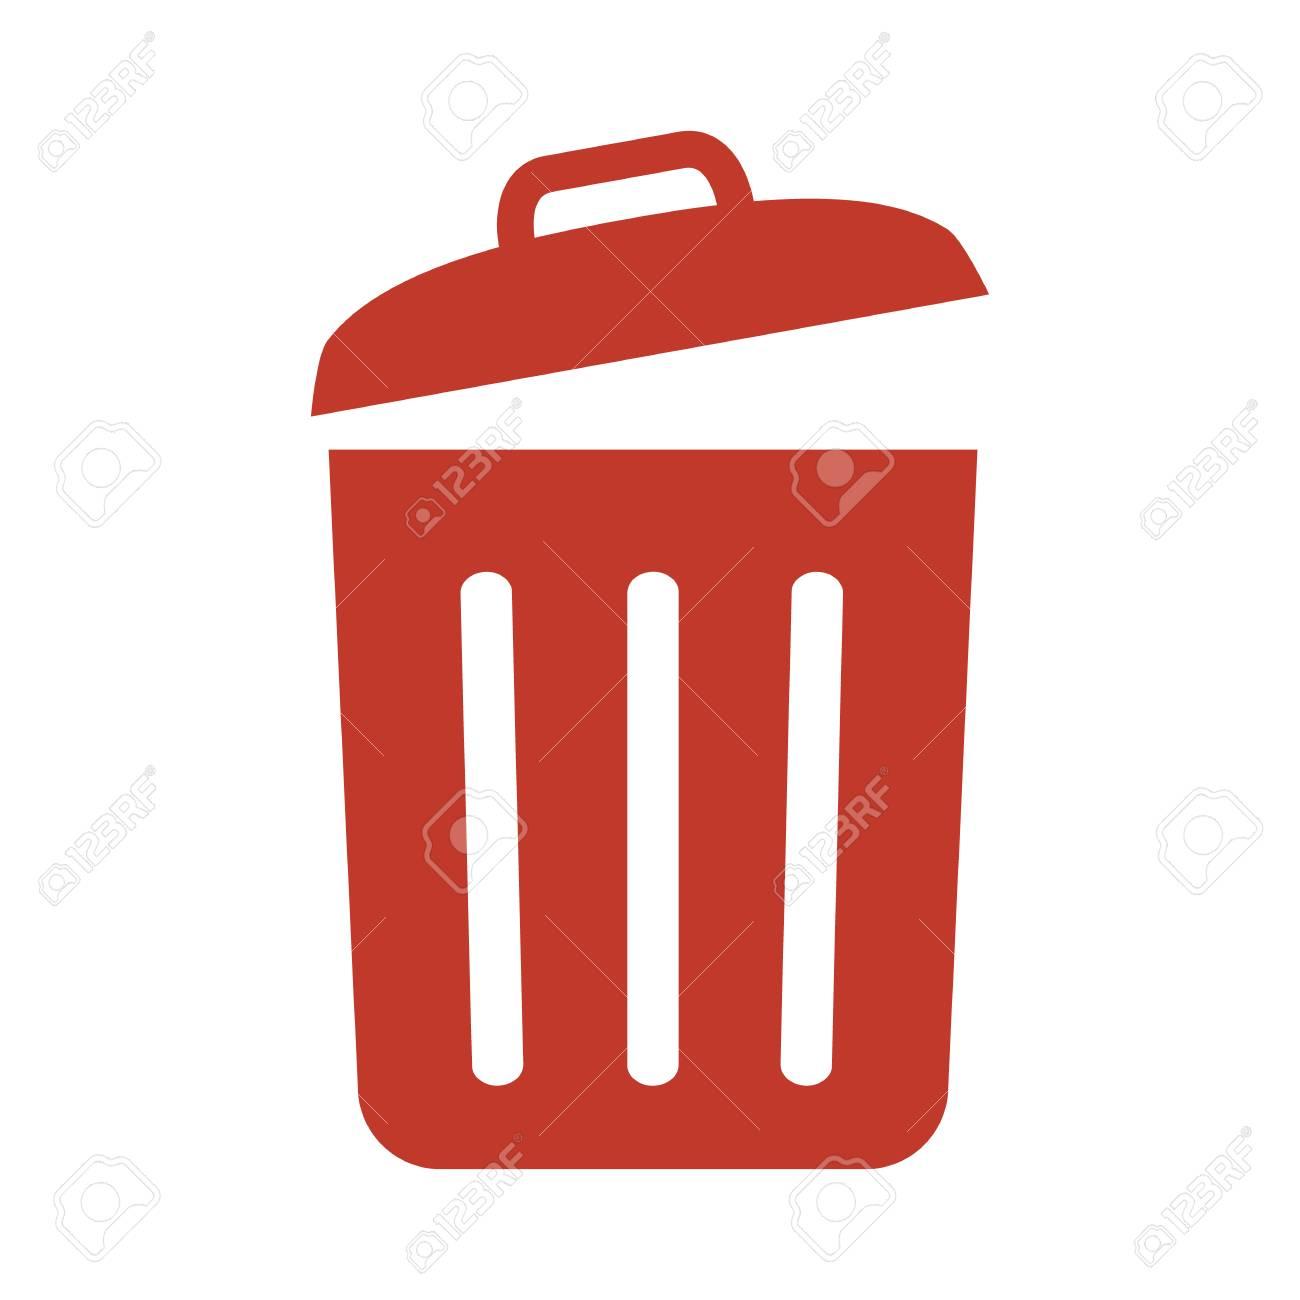 Trash bin icon on white background vector illustration - 96745173